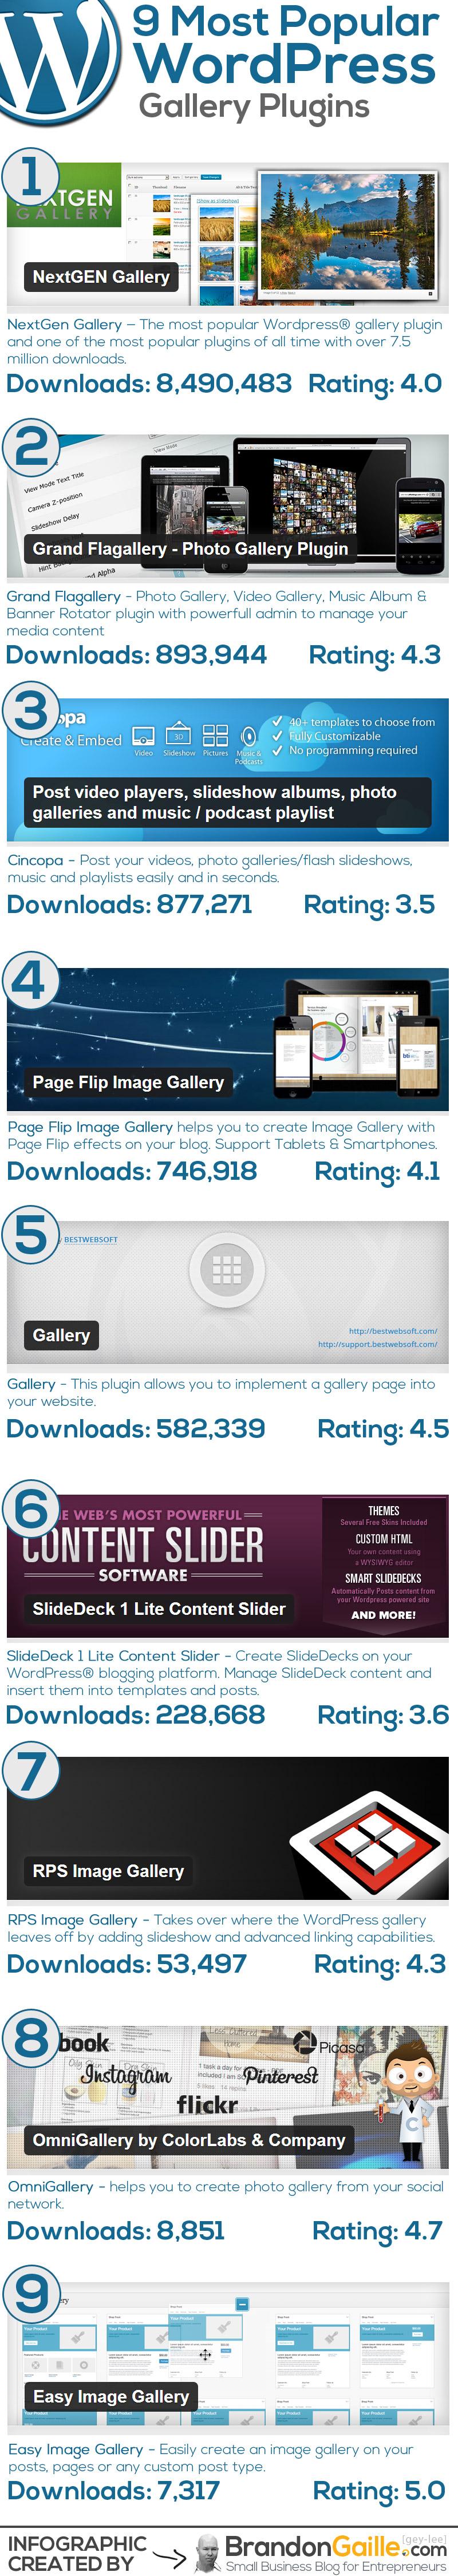 Best-Wordpress-Photo-Gallery-Plugins-Infographic